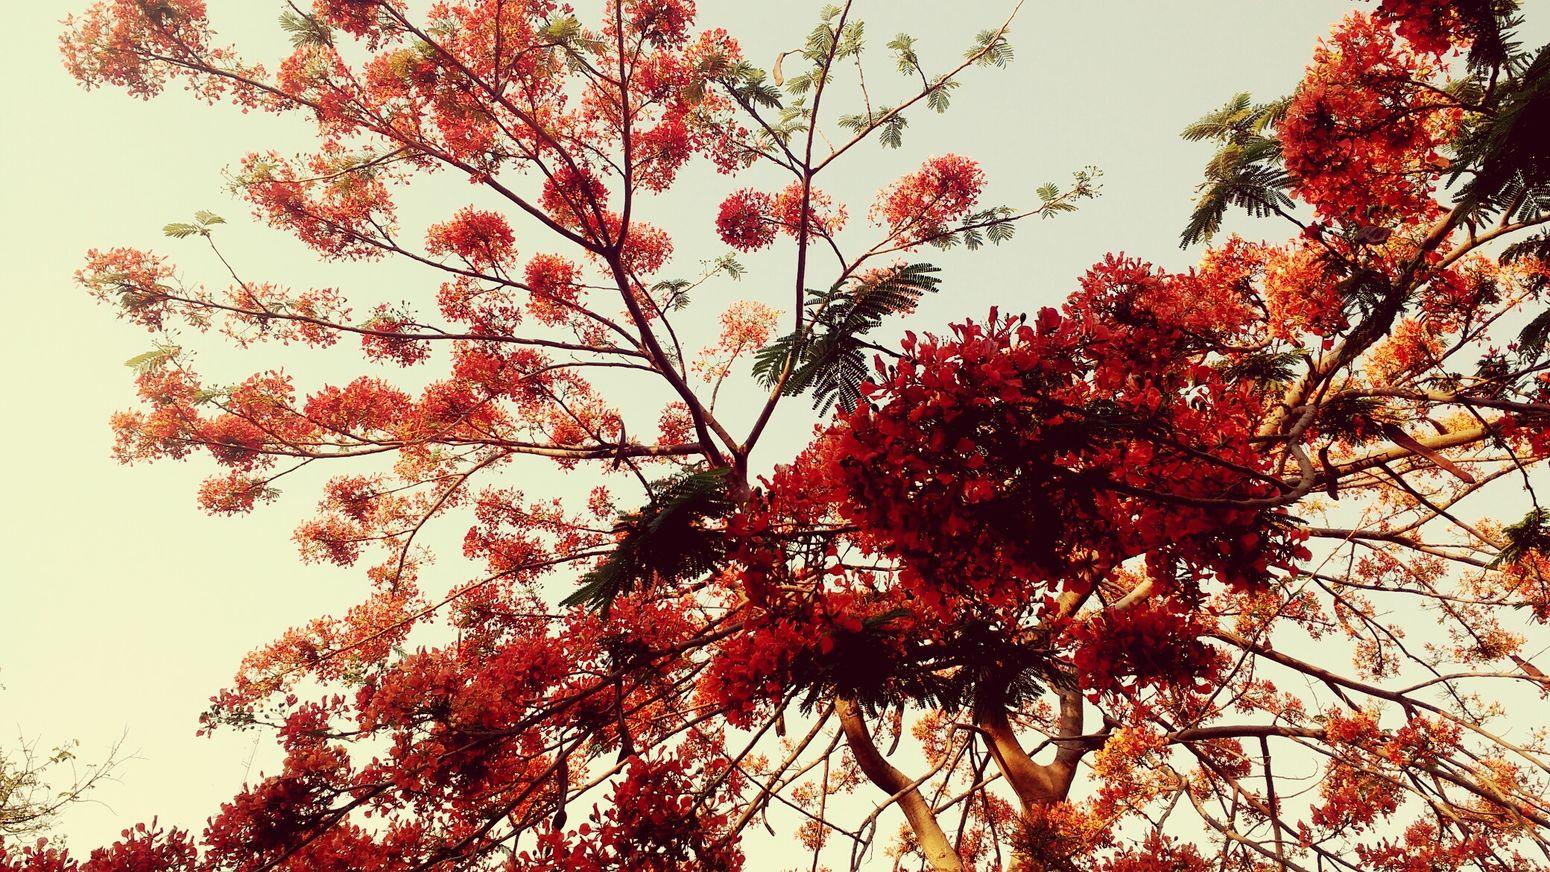 Beauty In Nature Espacios Con Encanto Nature árbol Naranja Sky Trees And Sky Belleza Natural Ramas De Arboles Colors Magia Natural Vida